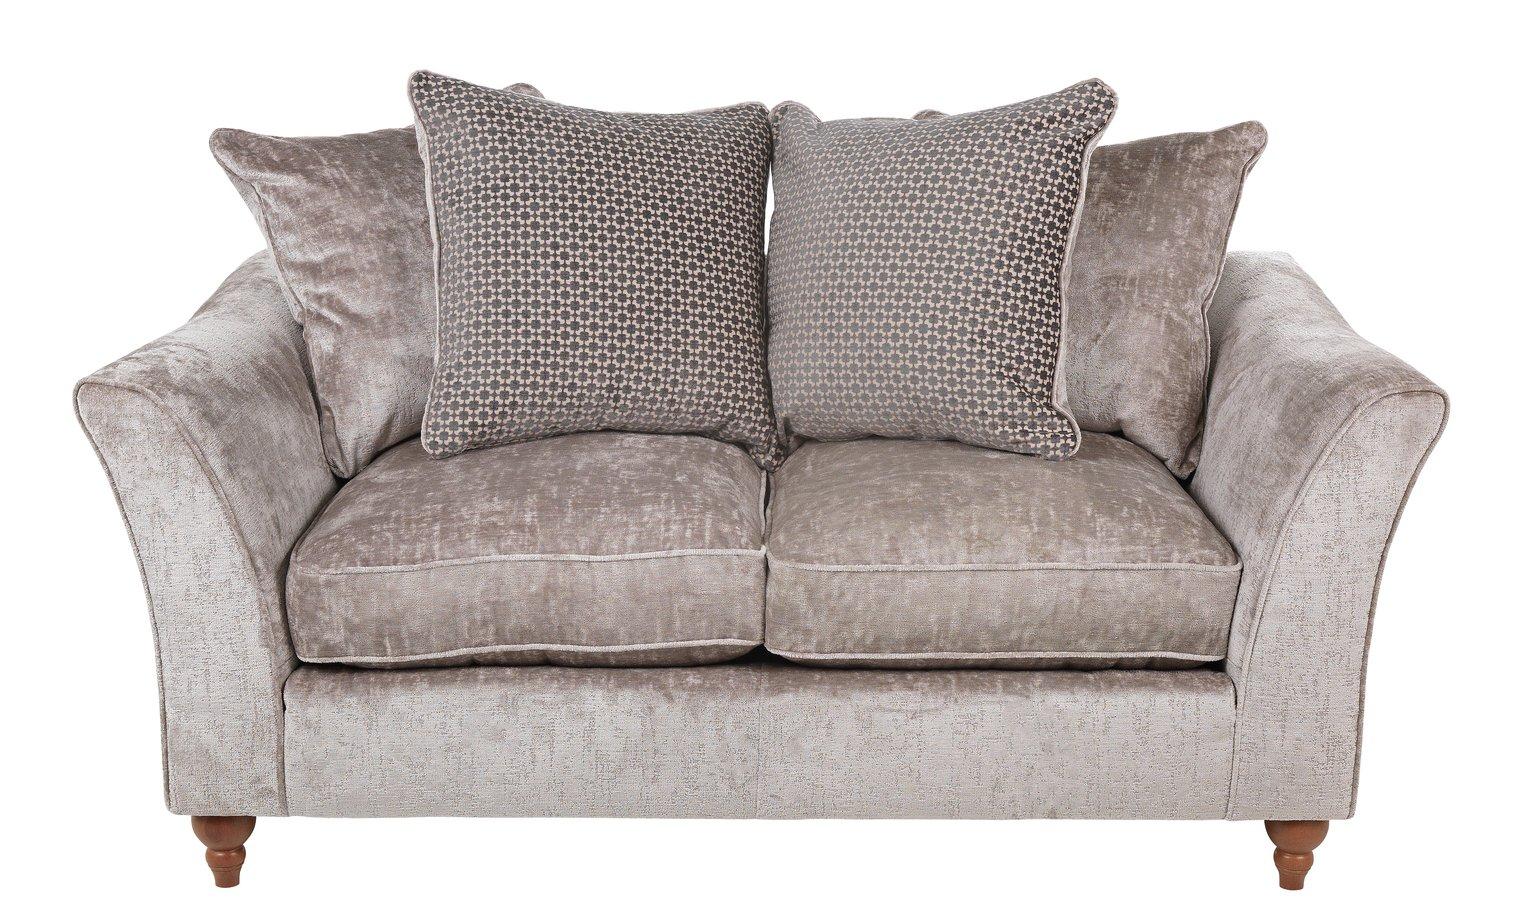 Argos Home Buxton Fabric 2 Seater Sofa - Truffle